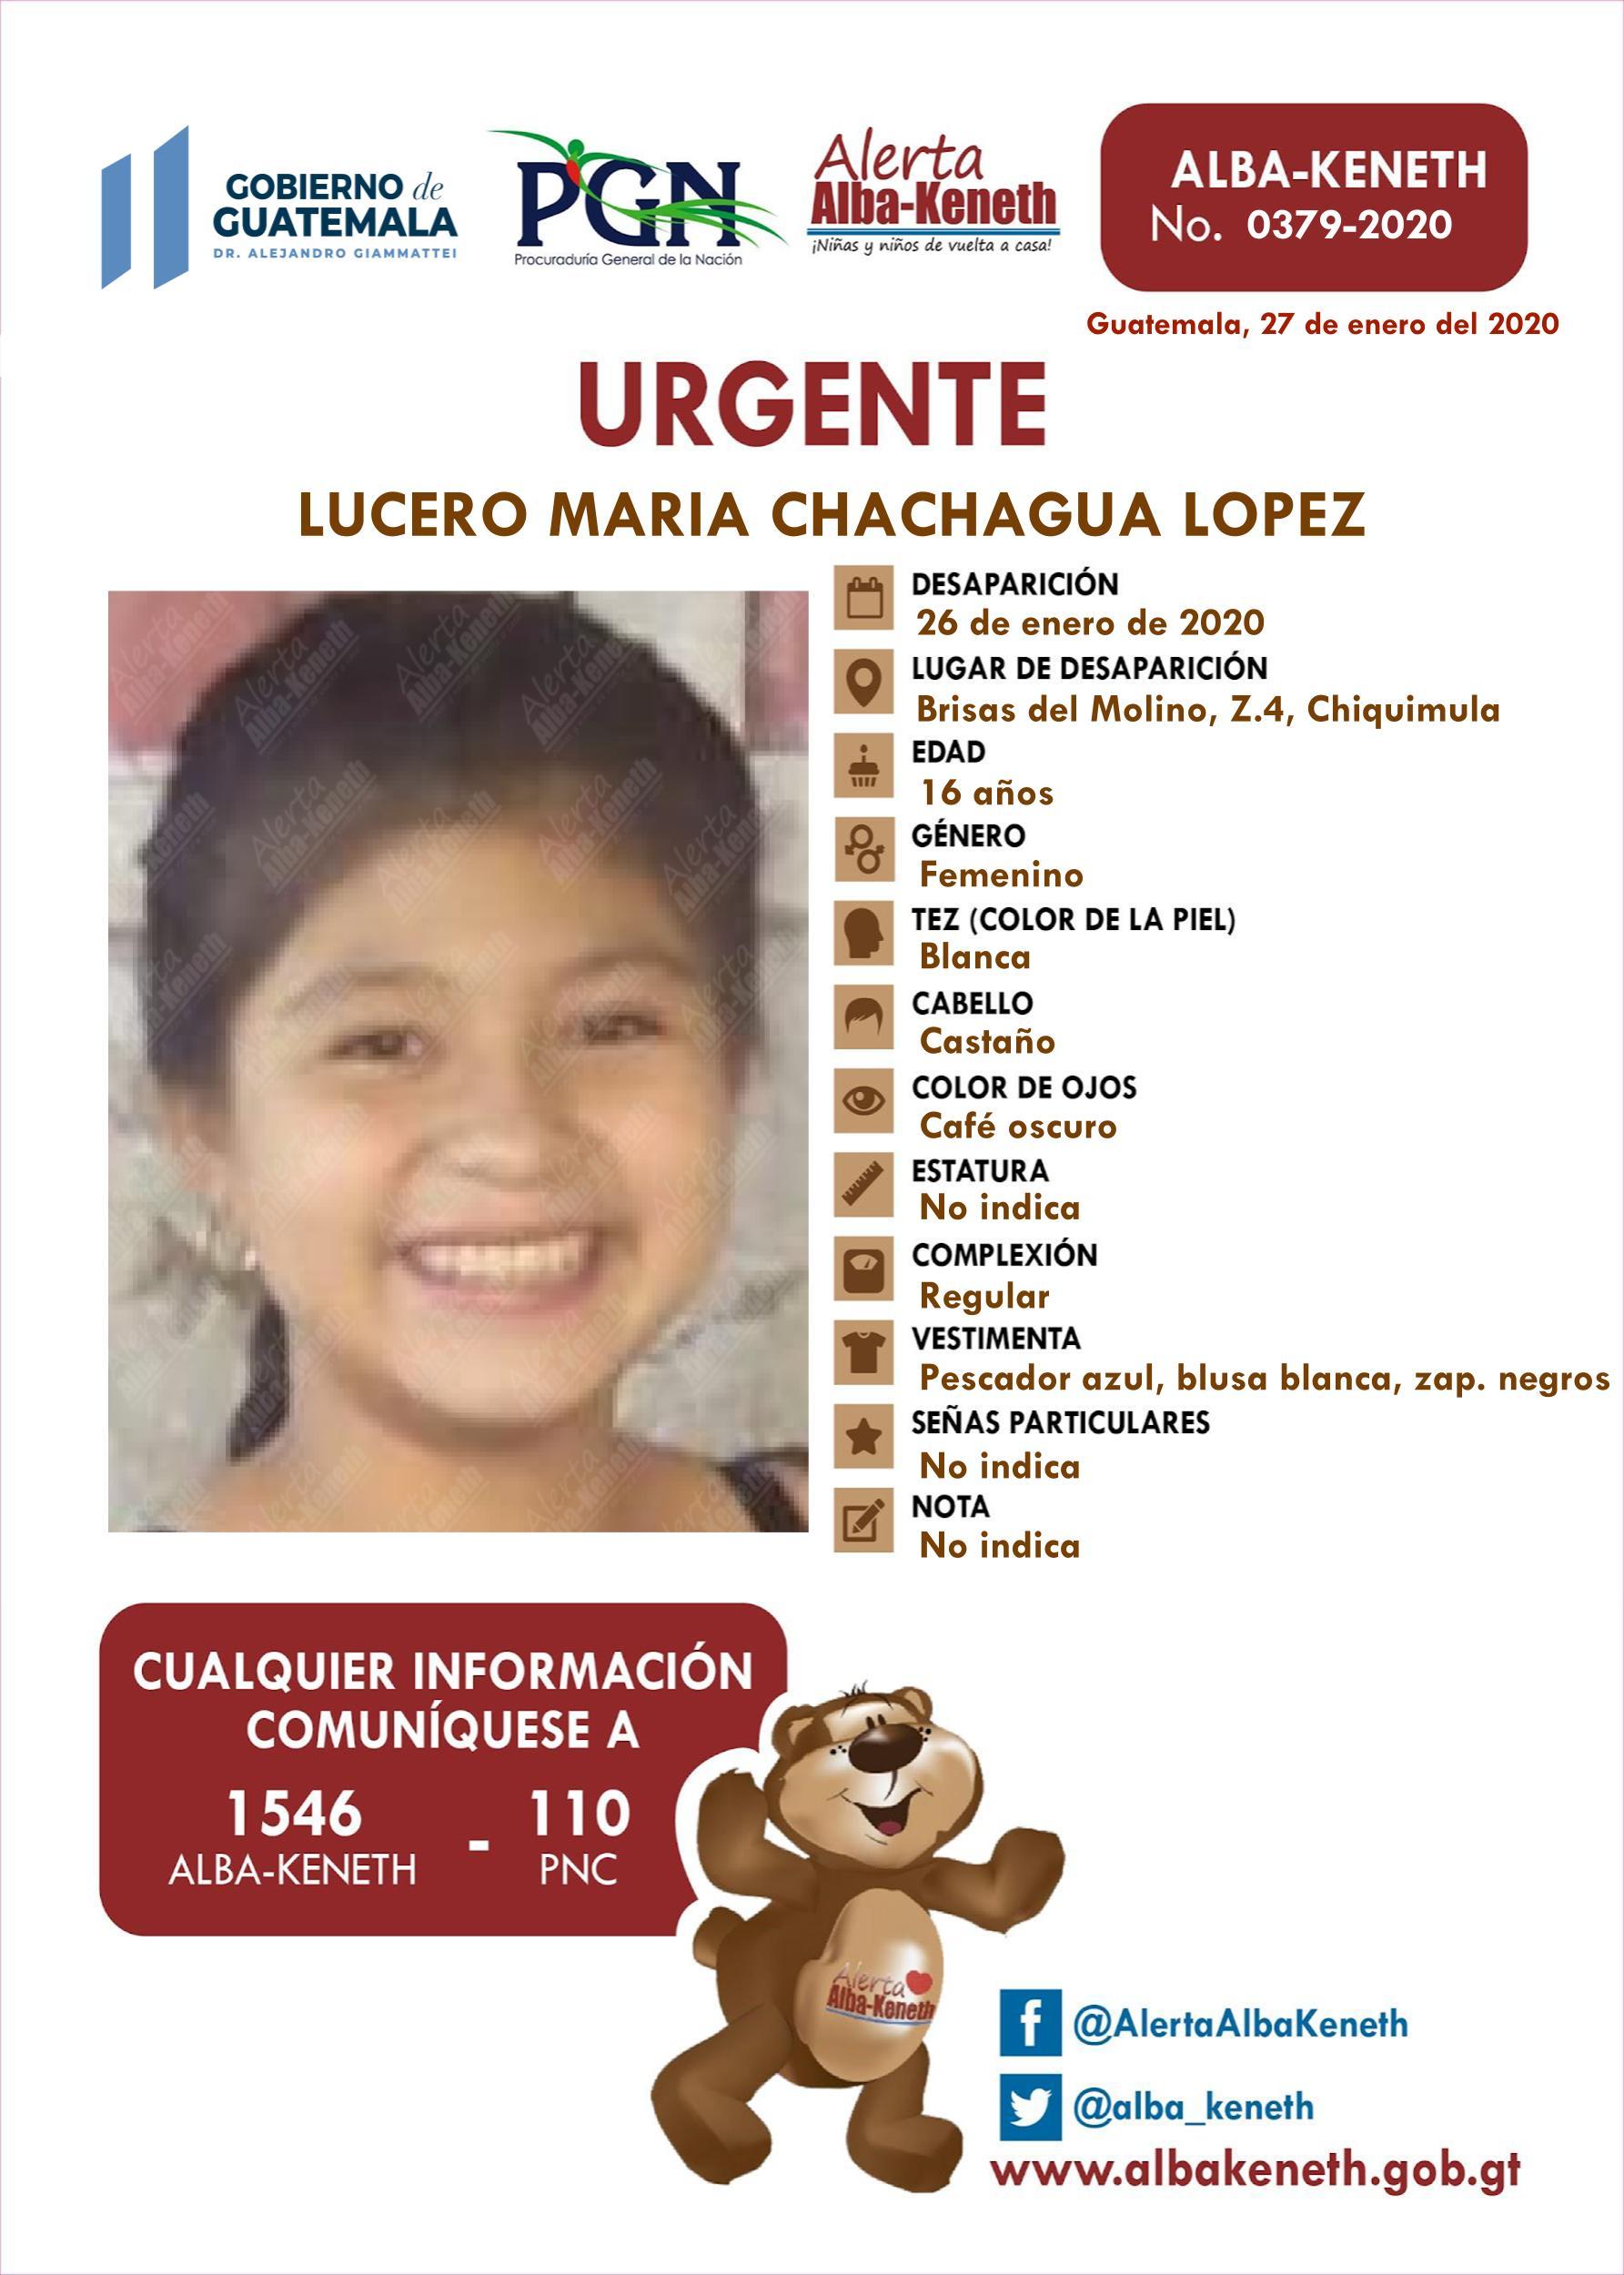 Lucero Maria Chachagua Lopez